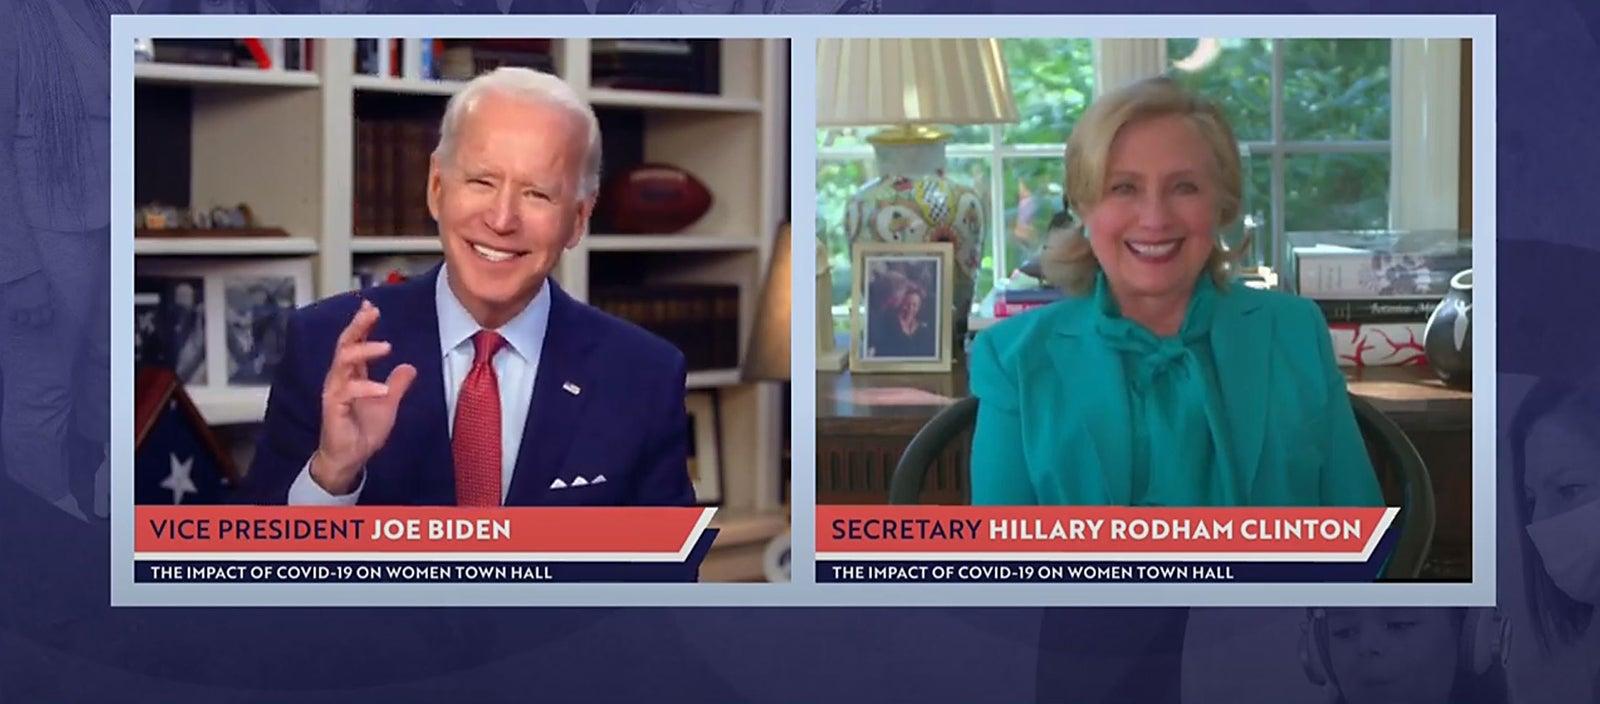 Hillary Clinton joins Joe Biden for virtual town hall.